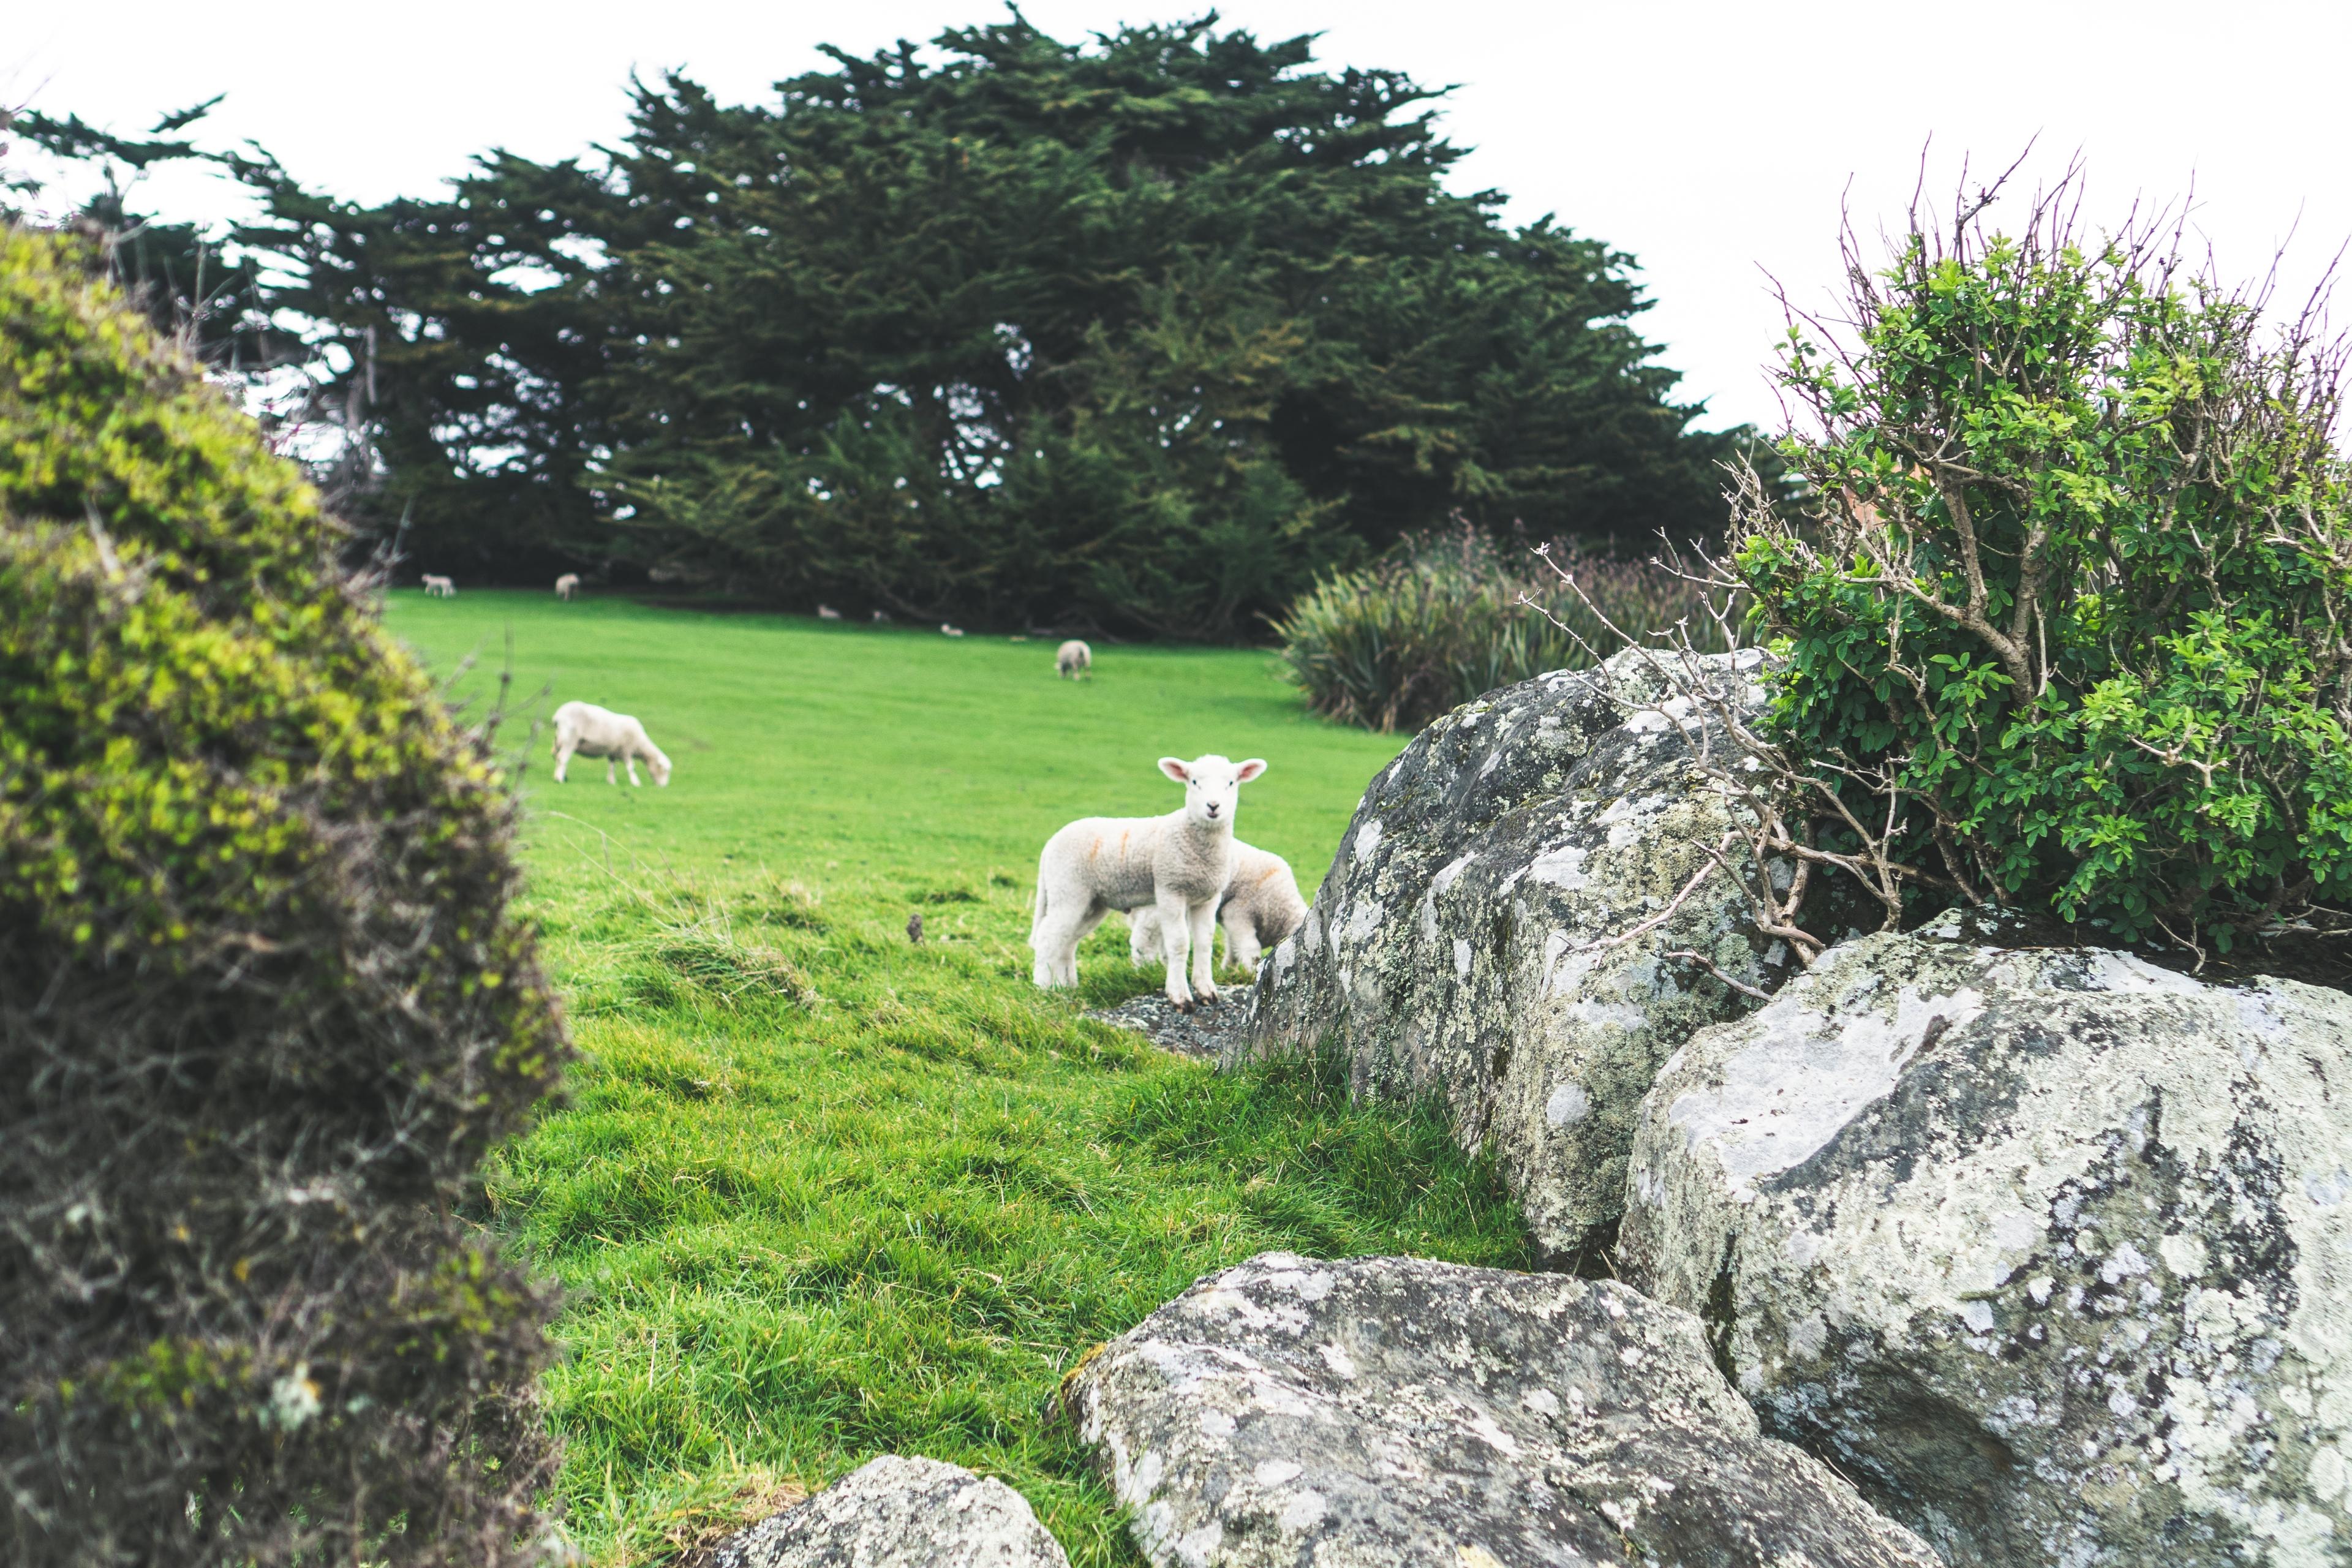 General 3840x2560 Animal Farm sheep nature landscape New Zealand trees rock